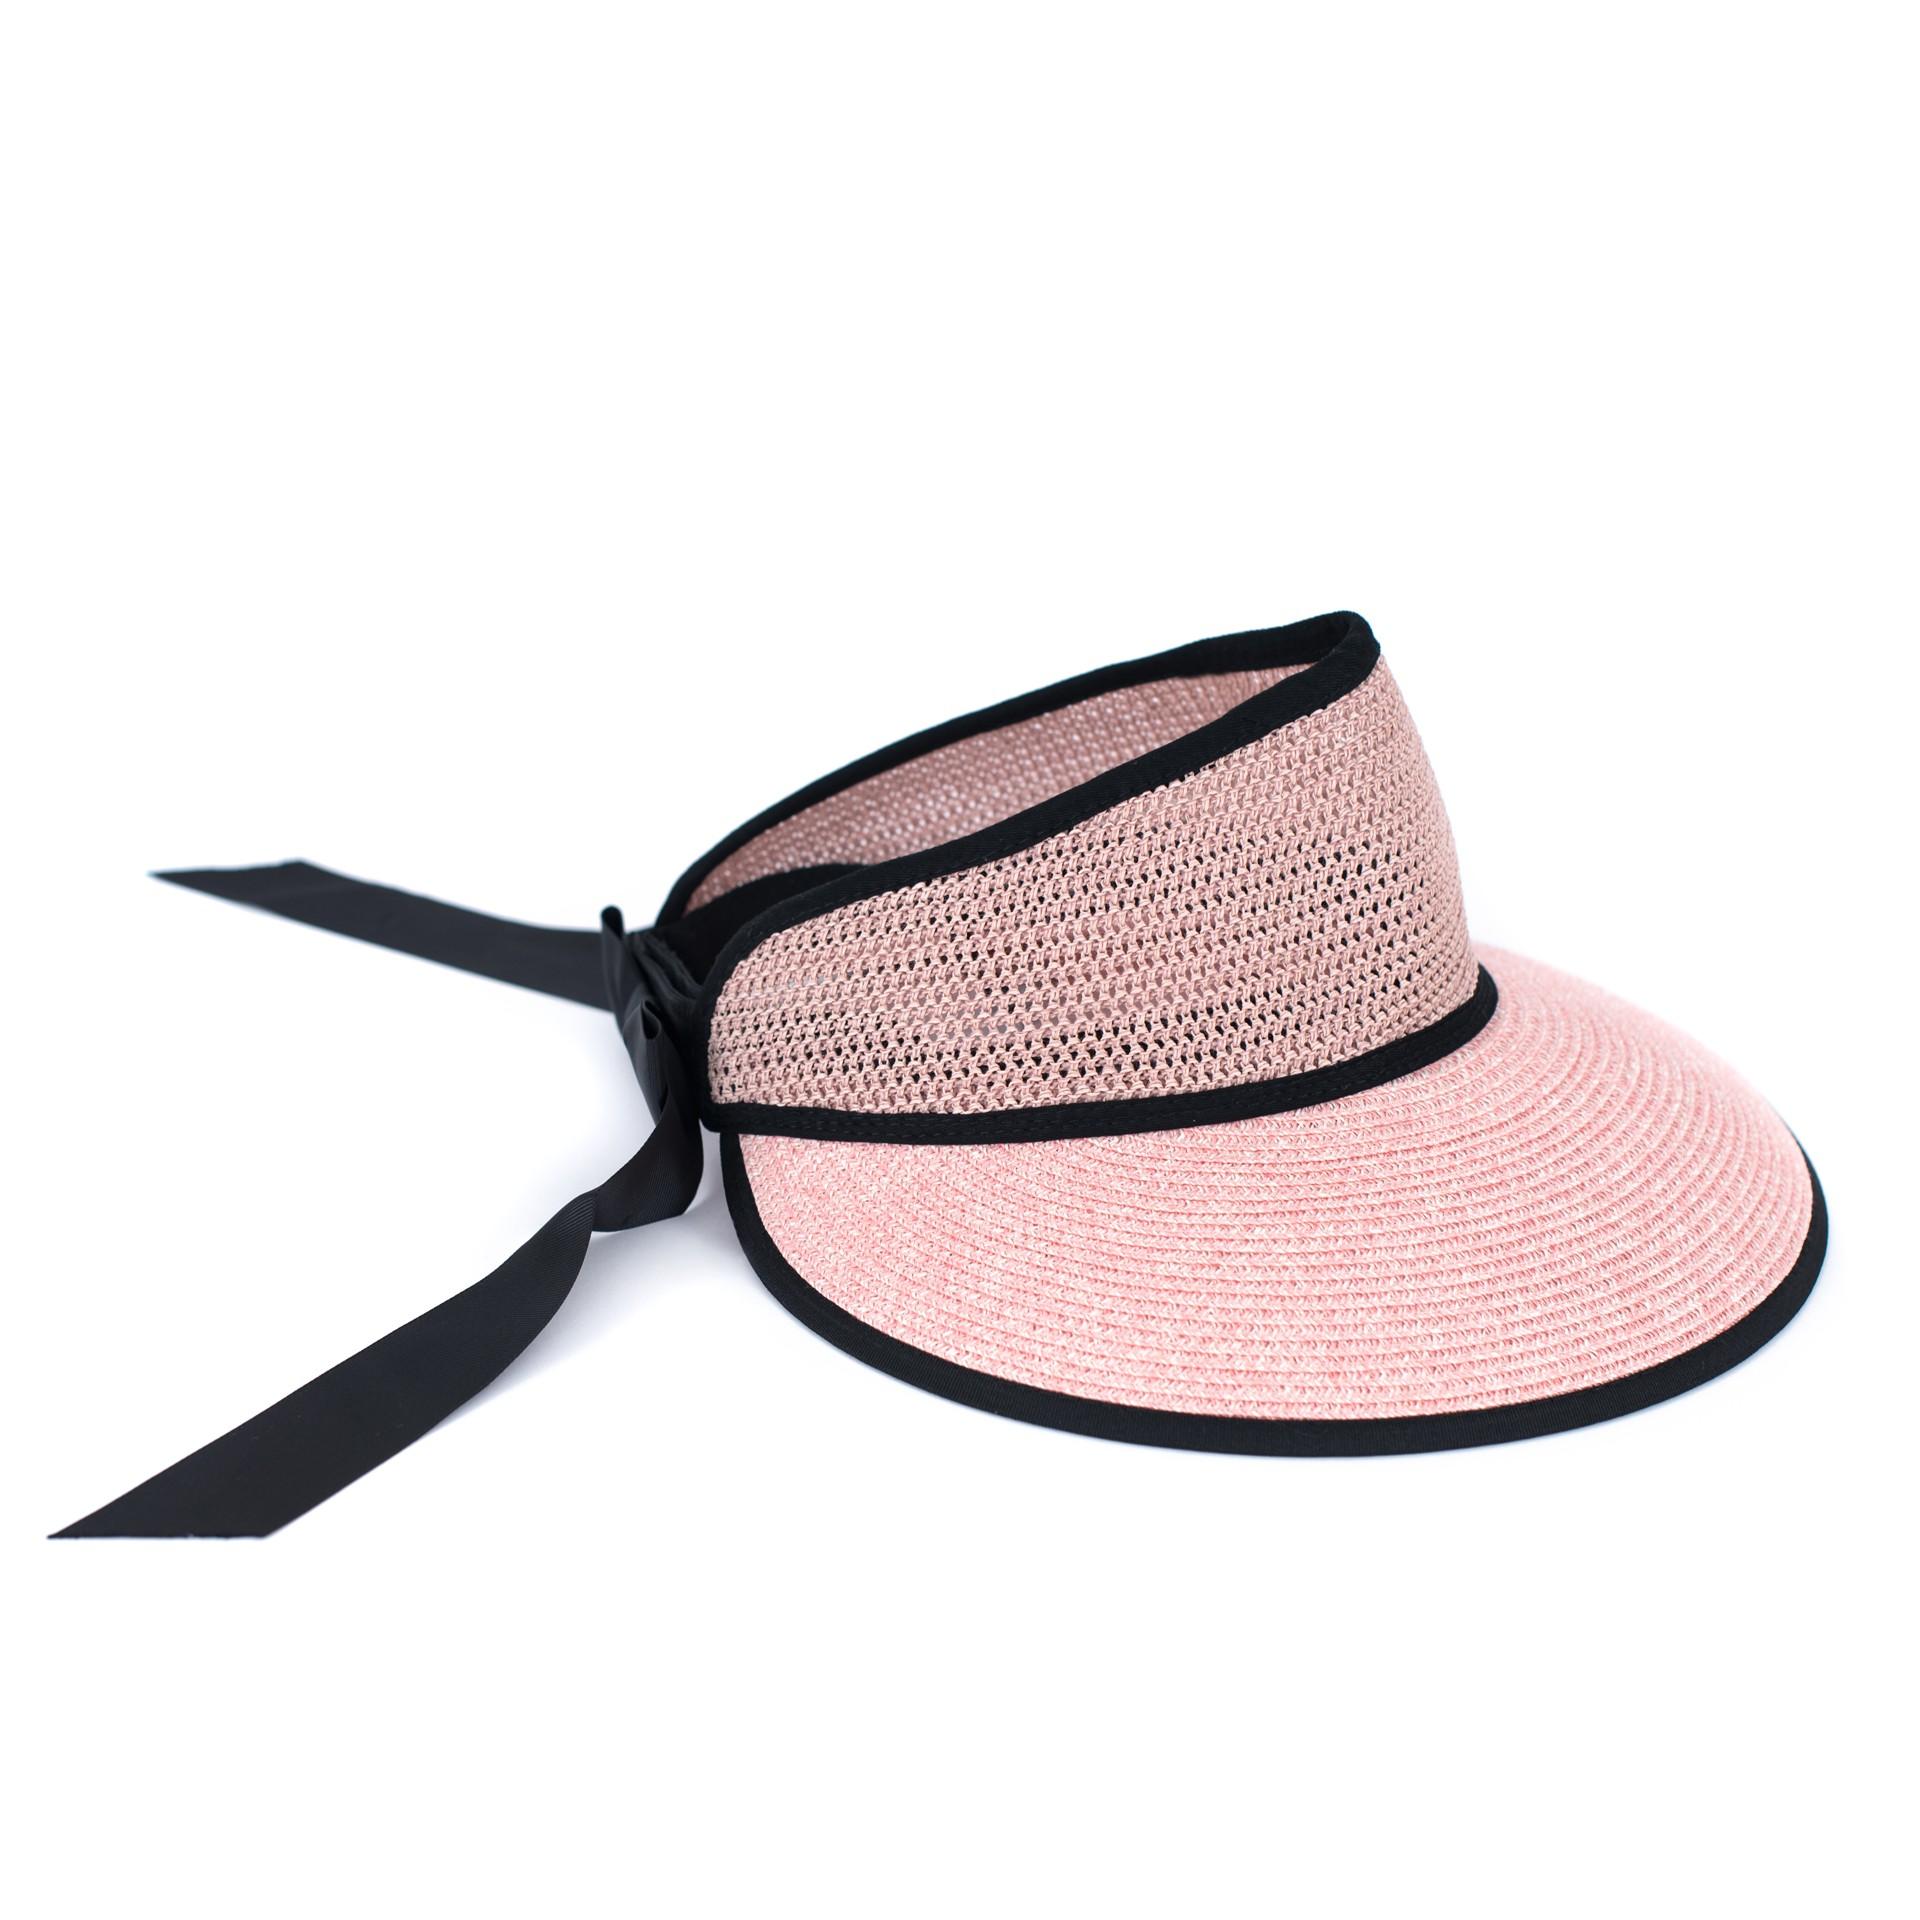 Art Of Polo Woman's Visor Hat cz19320 Light